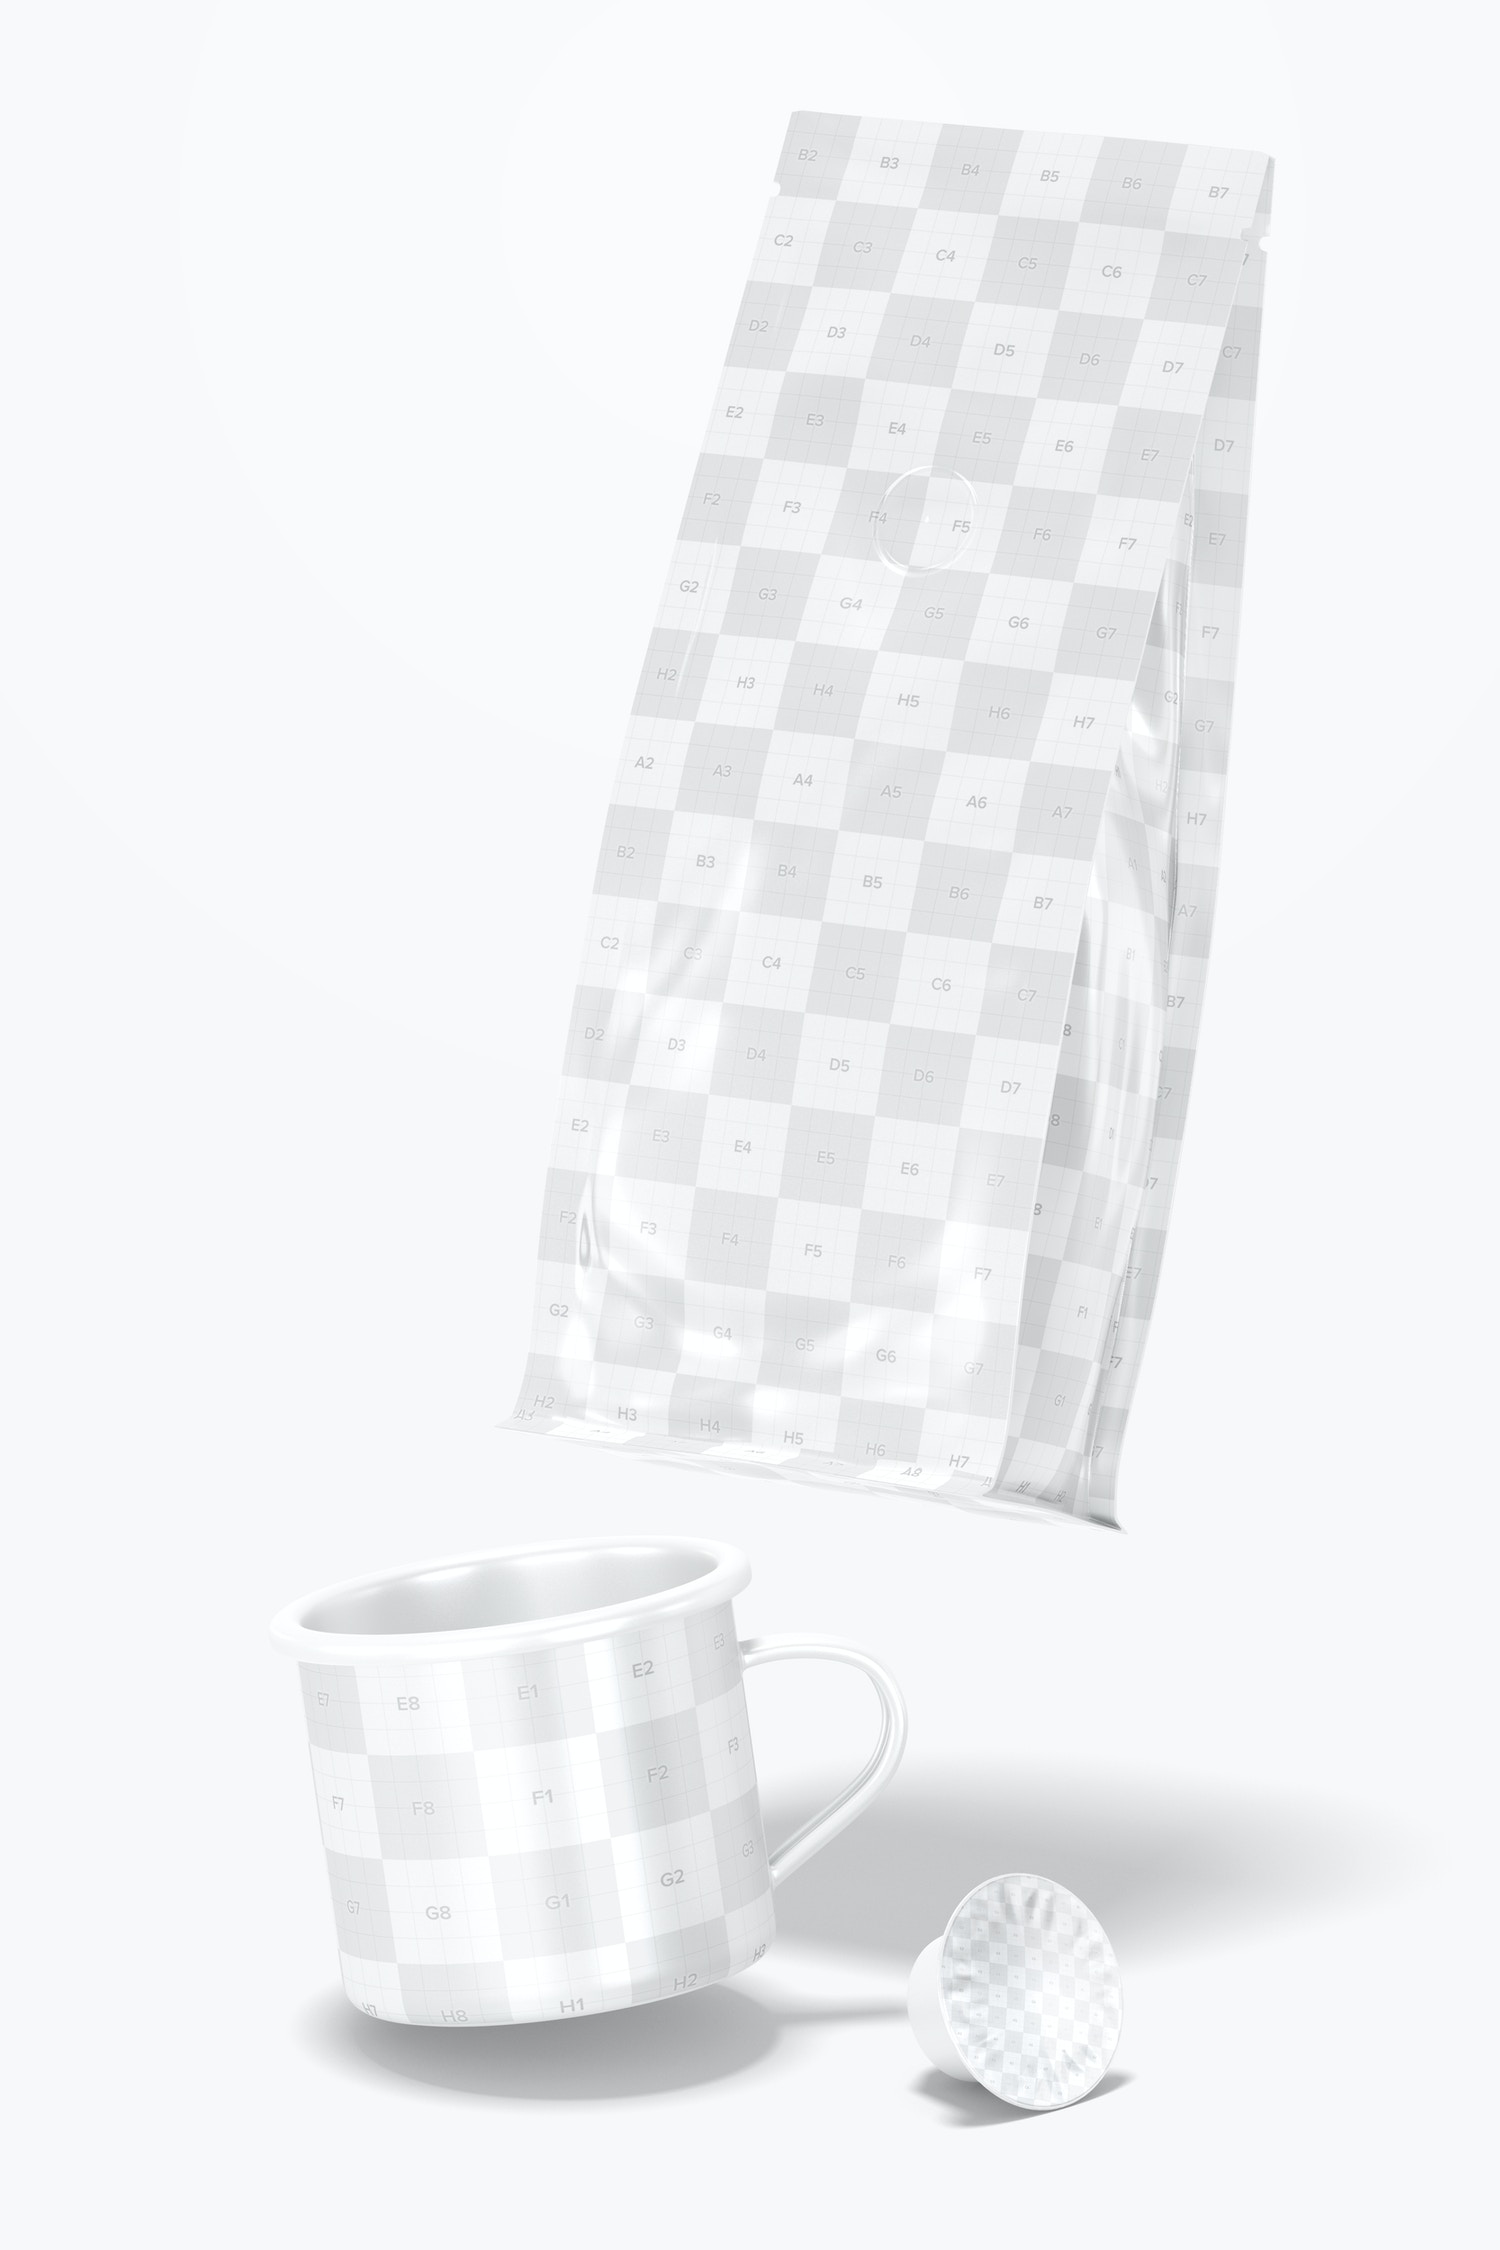 Coffee Packaging Scene Mockup, Falling